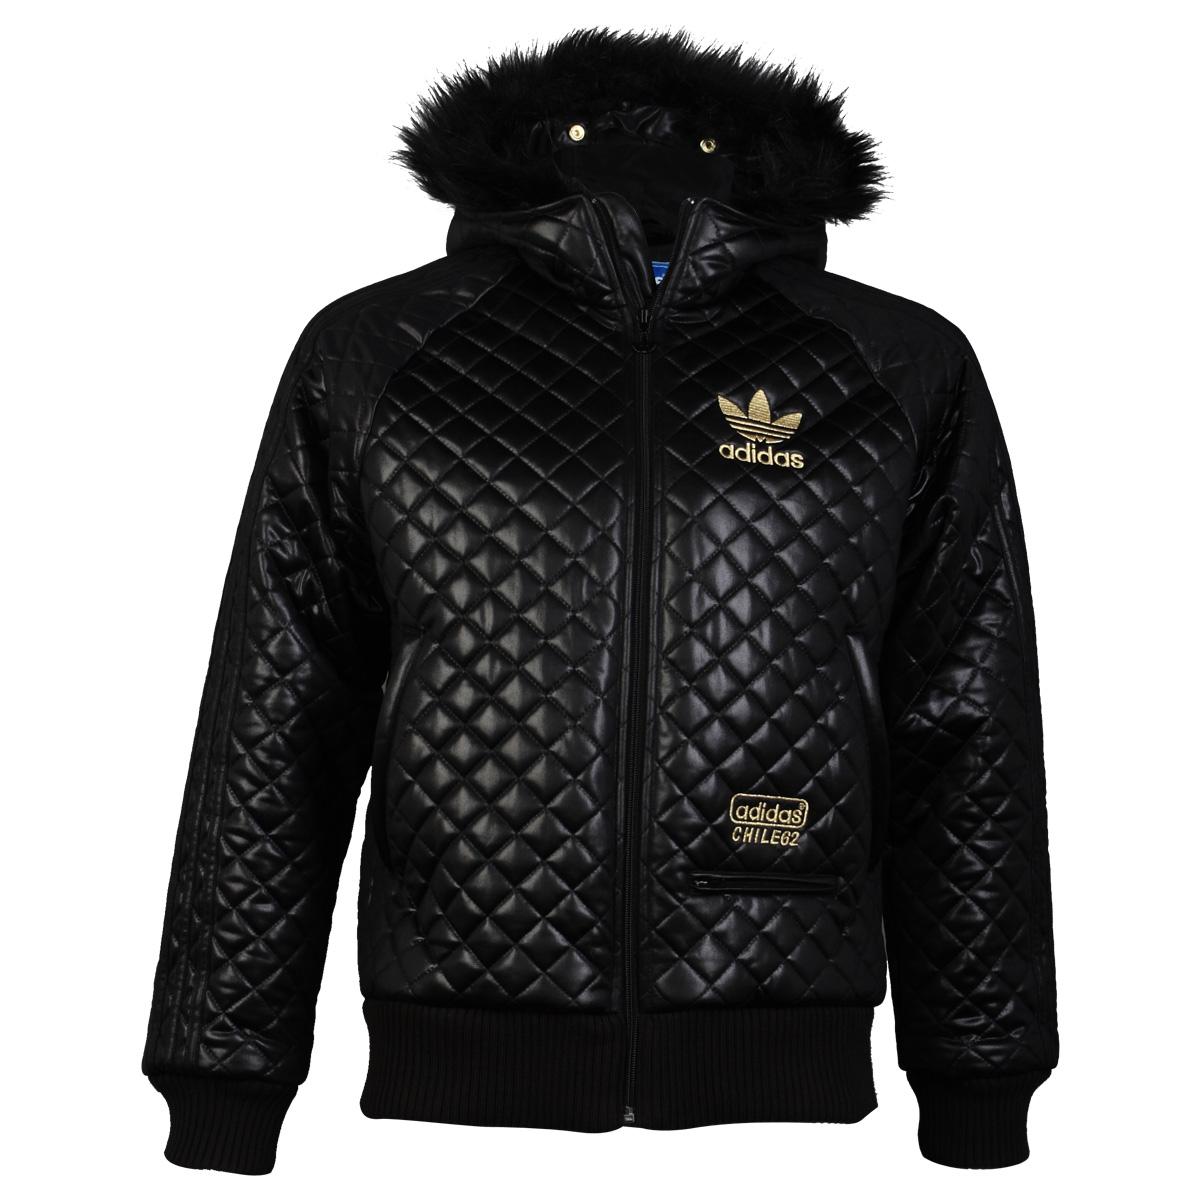 Mens Adidas Originals Black Quilted Wet Look Faux Fur Bomber Jacket Size XS-XL   EBay